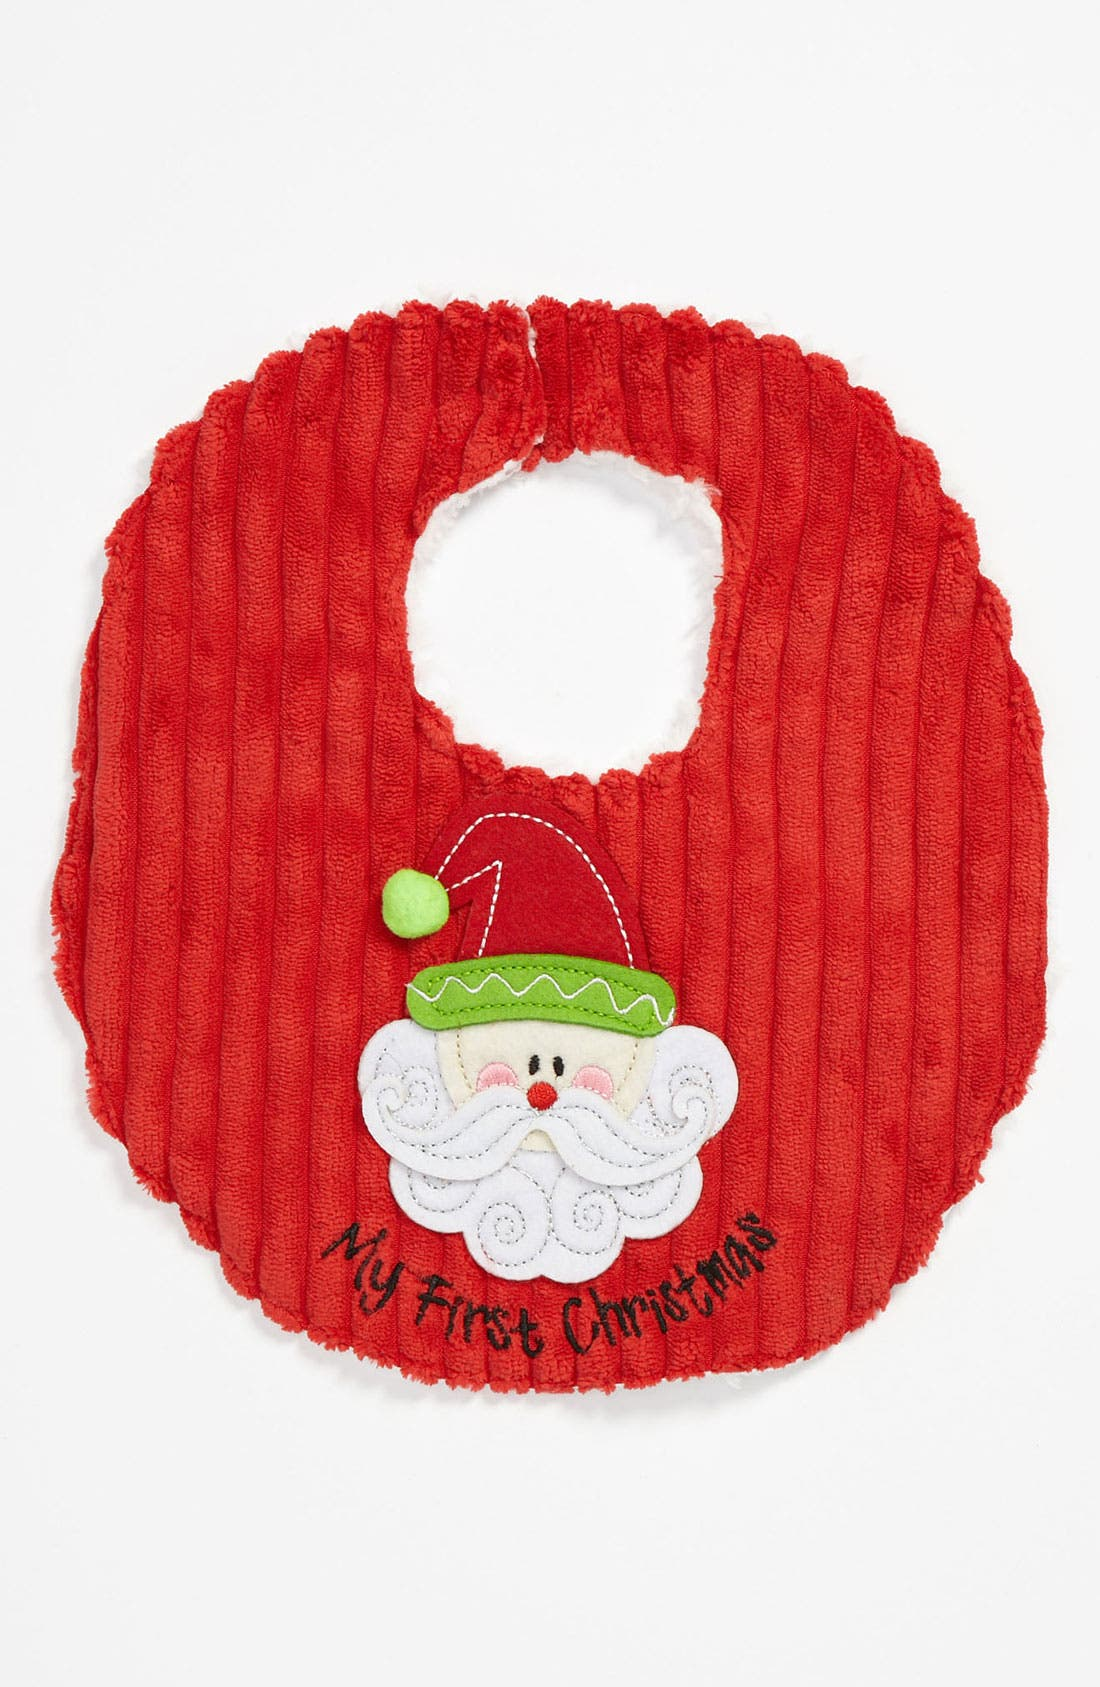 Alternate Image 1 Selected - Mud Pie 'My First Christmas' Bib